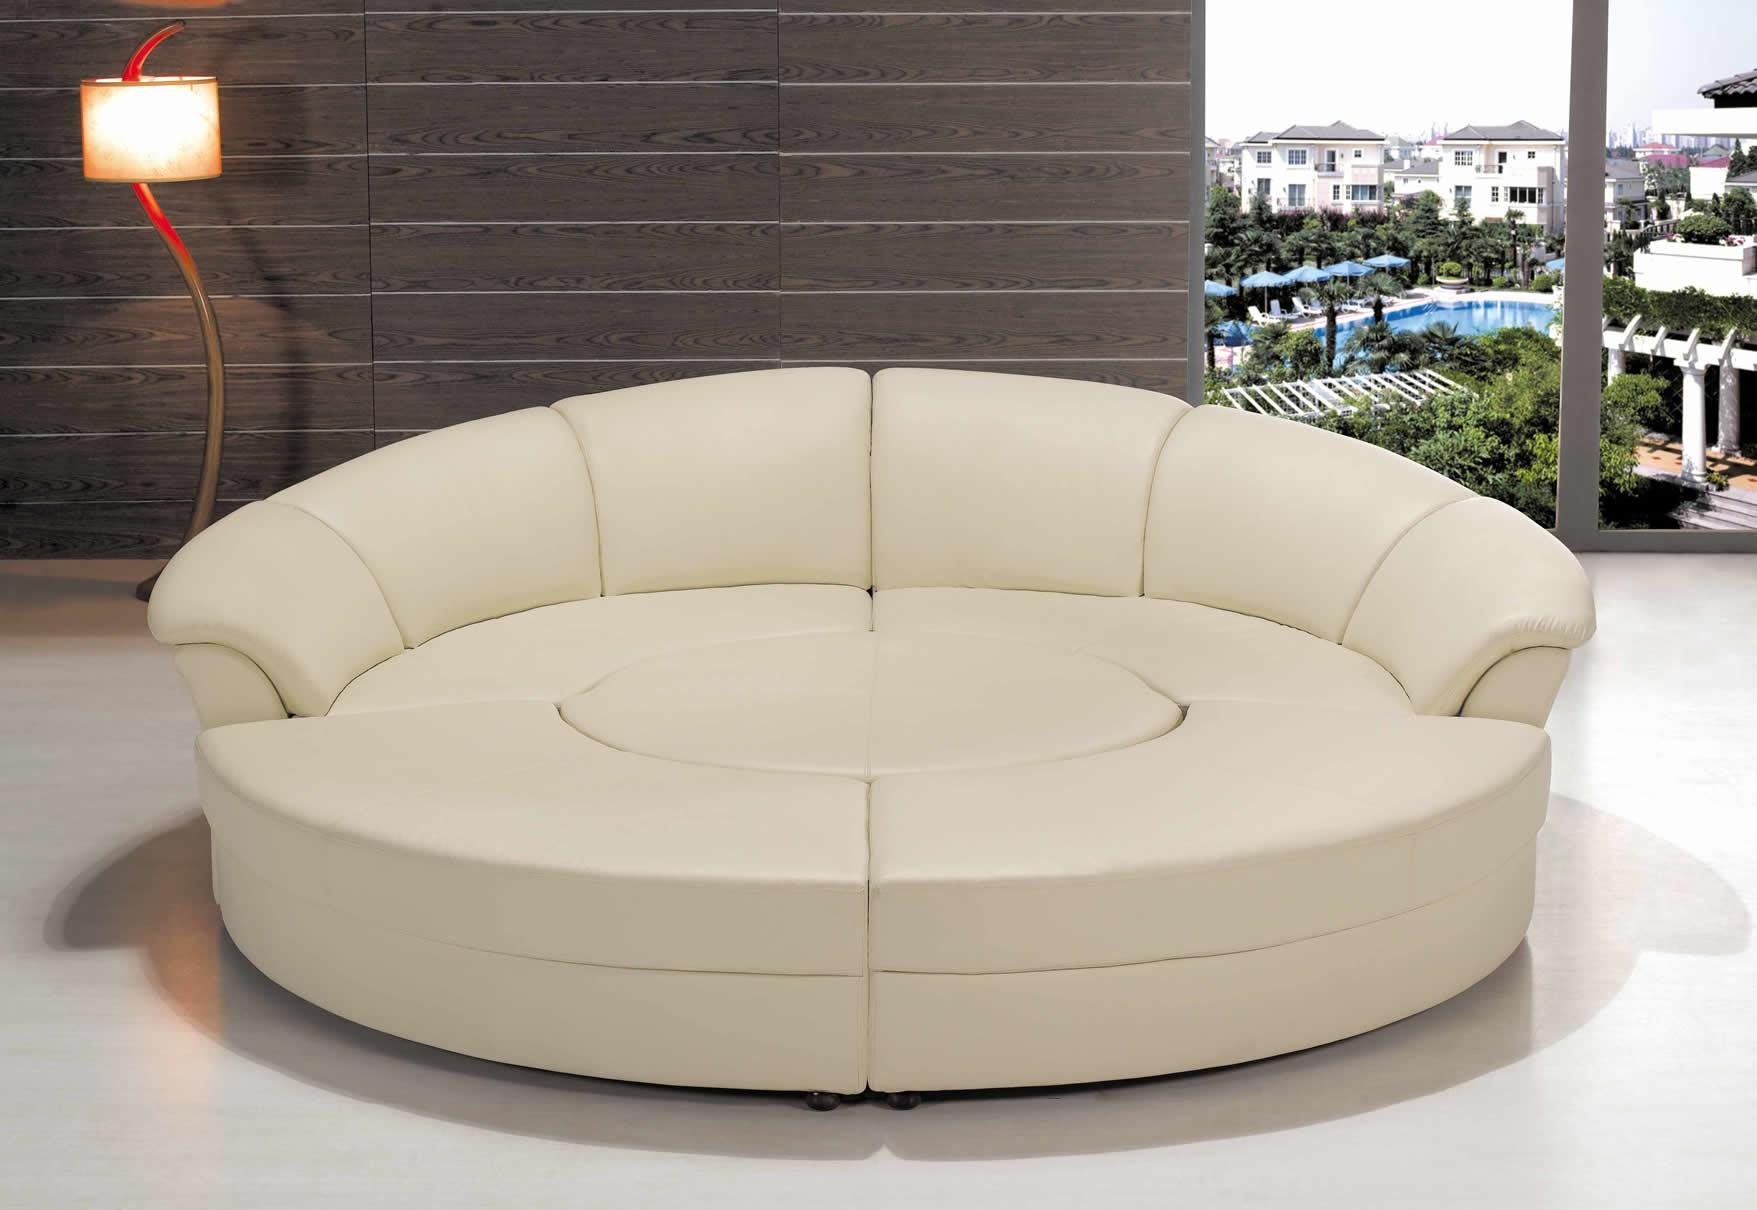 Круглый кожаный диван